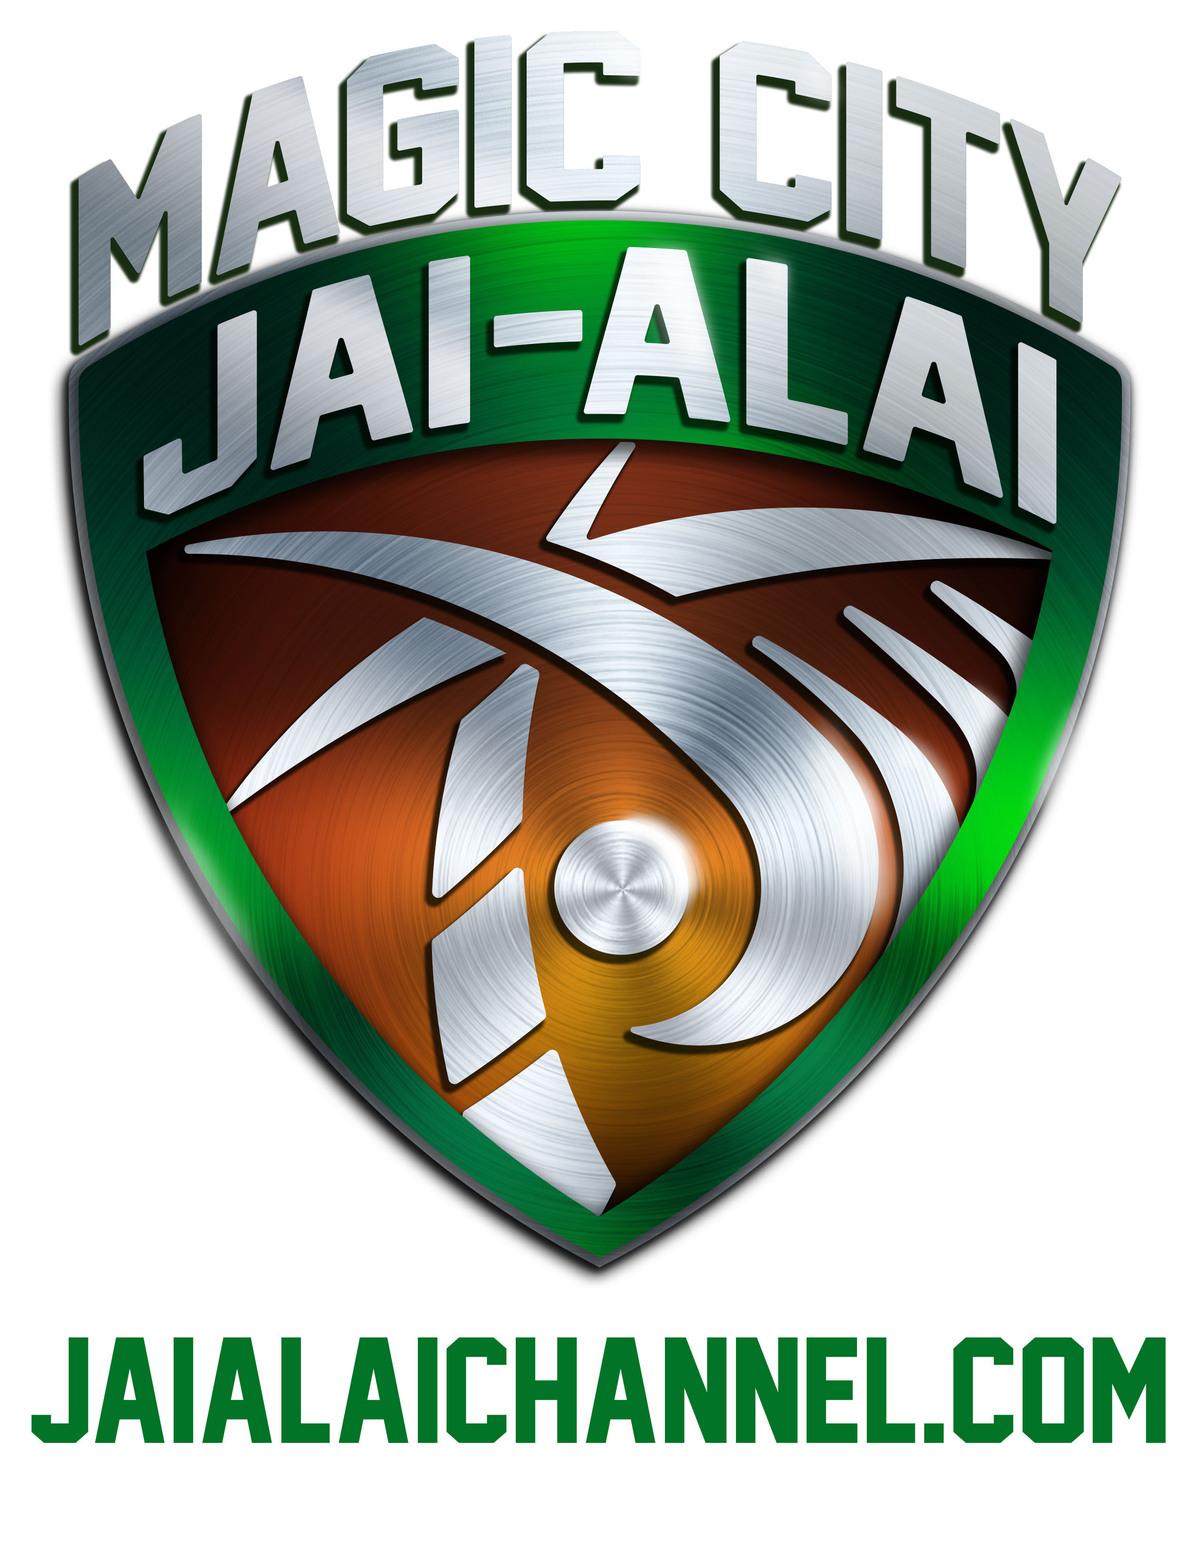 Jai-Alai H2H - Doubles H2H - Sat. May 29, 2021